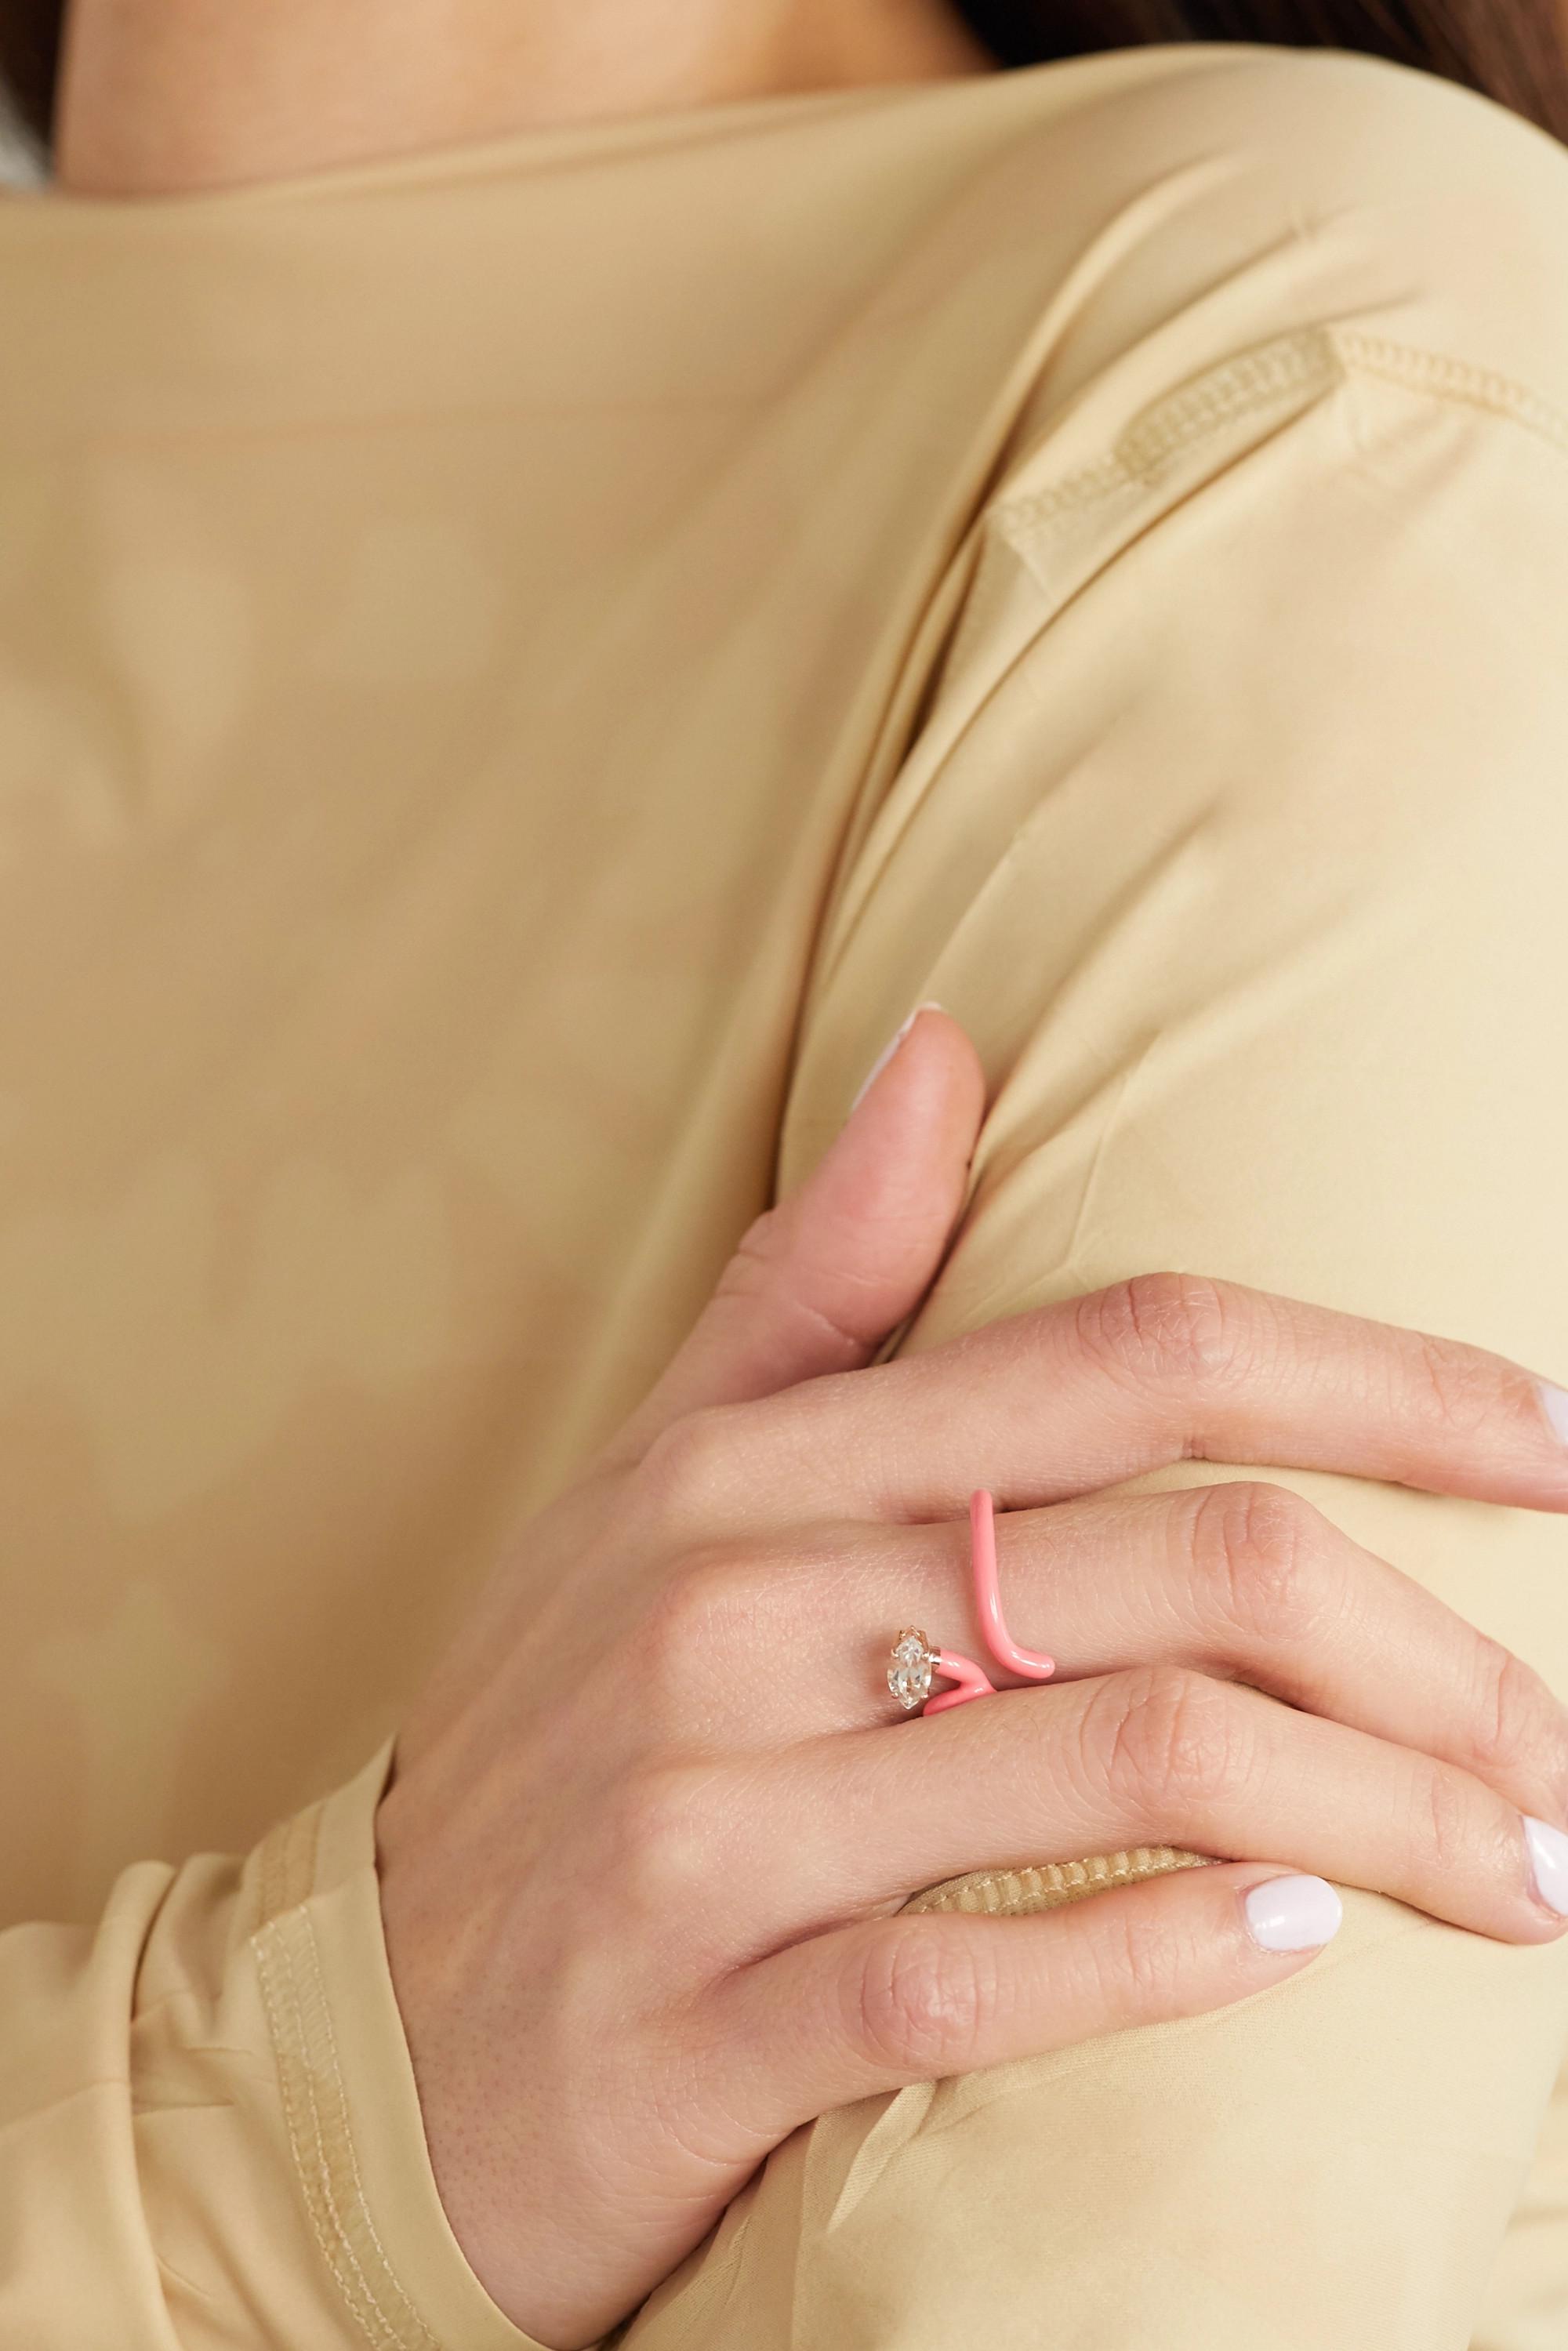 Bea Bongiasca Baby Vine Tendril rose gold, enamel and rock crystal ring